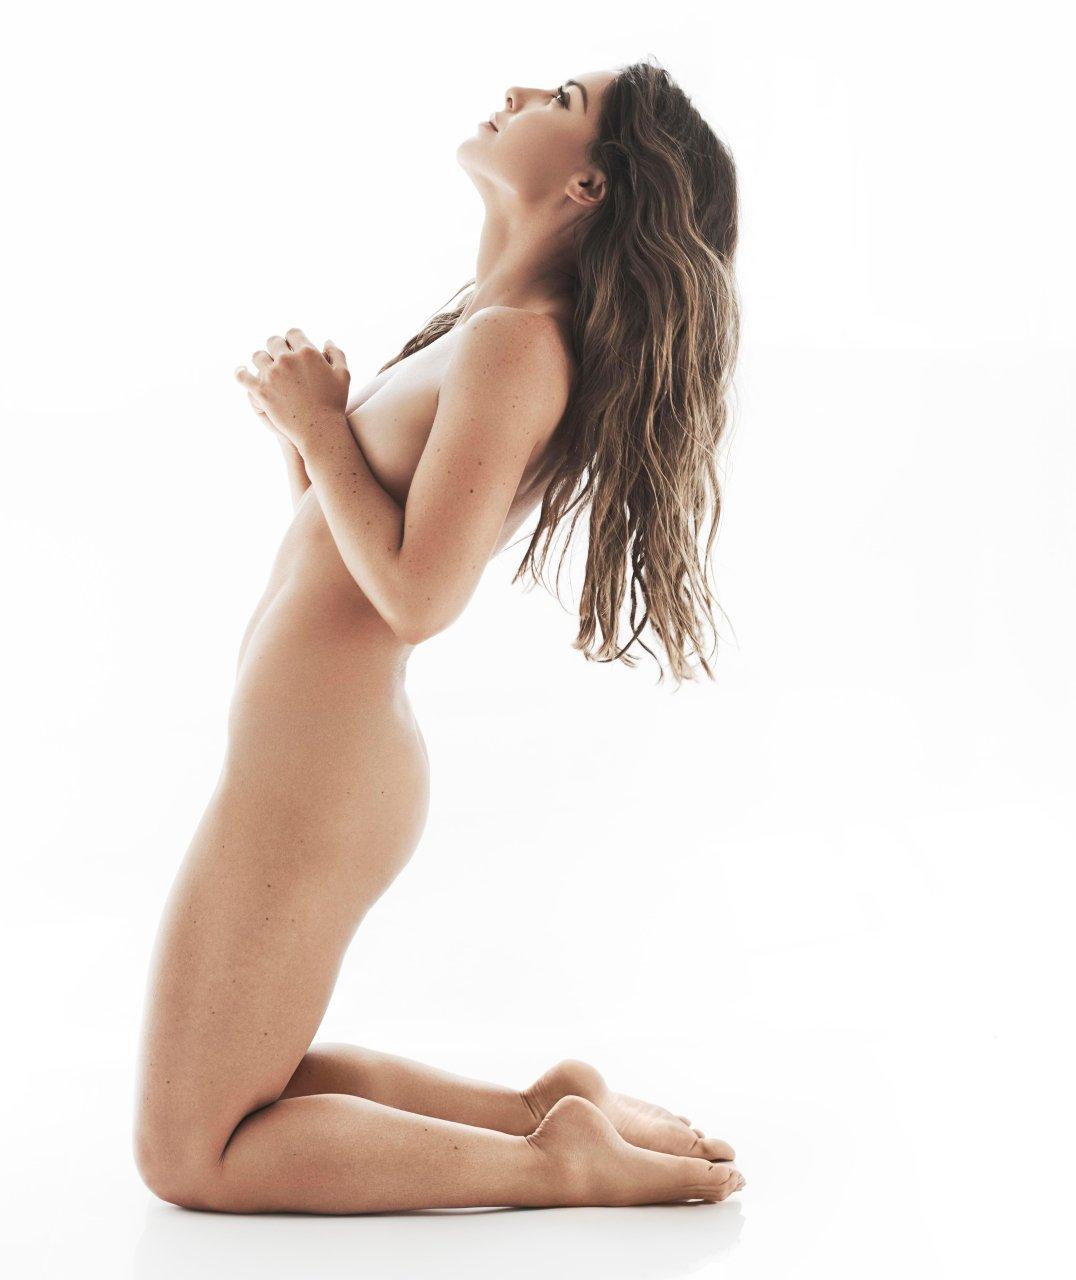 Louise thompson naked photos - 2019 year